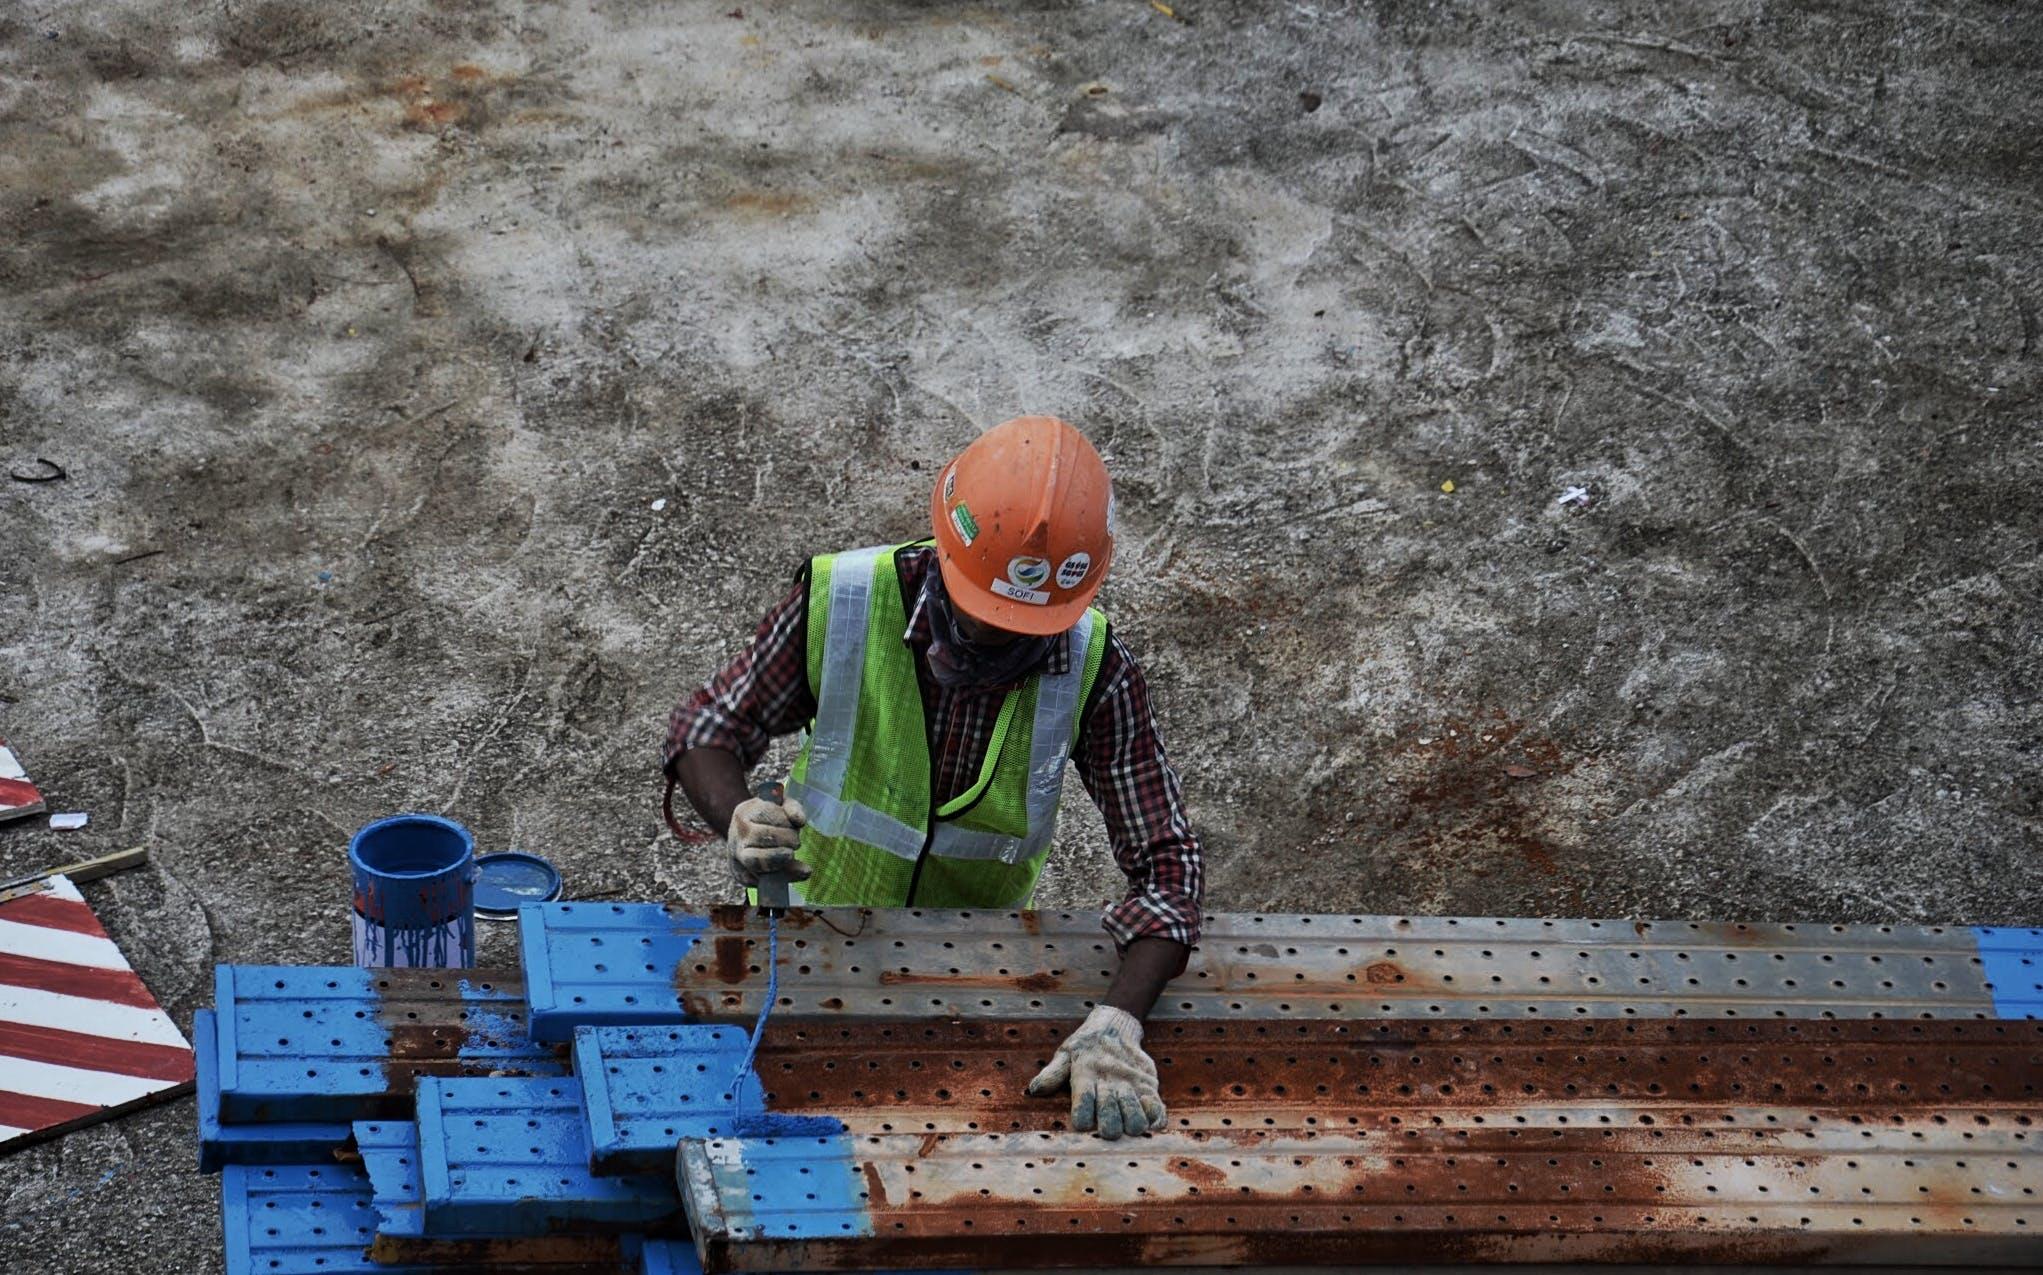 Free stock photo of #construction, #everydaypeople, #gray, #moody